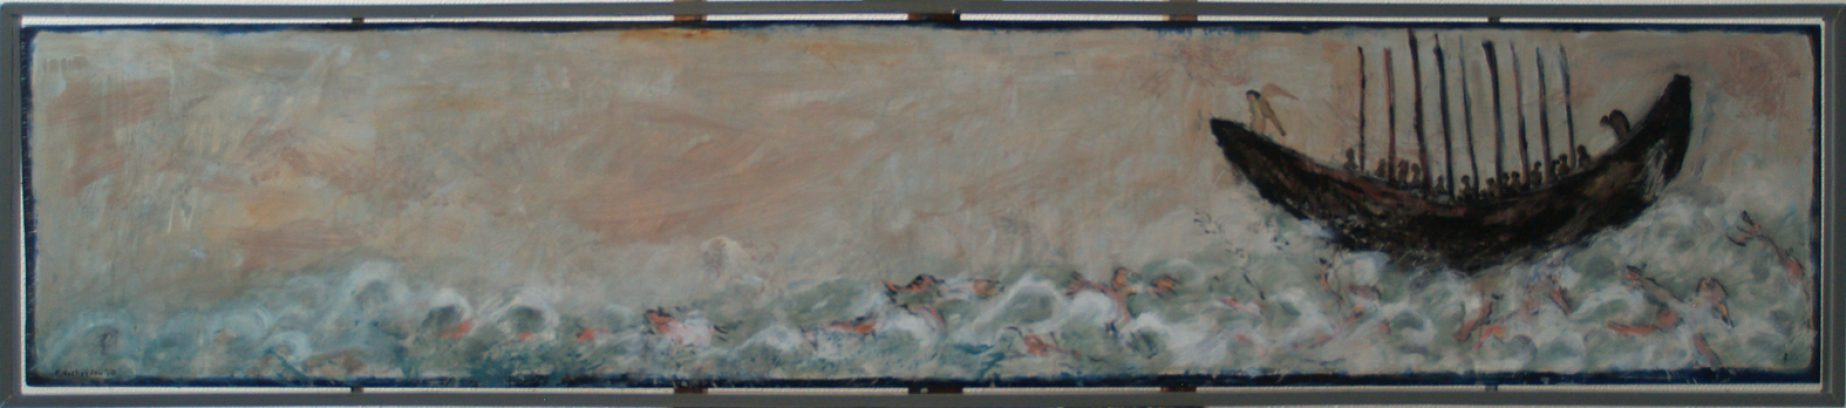 """Styx"" uit de serie: ""Ars Moriendi 2"" olie/paneel  44x205,5 cm. 2017"